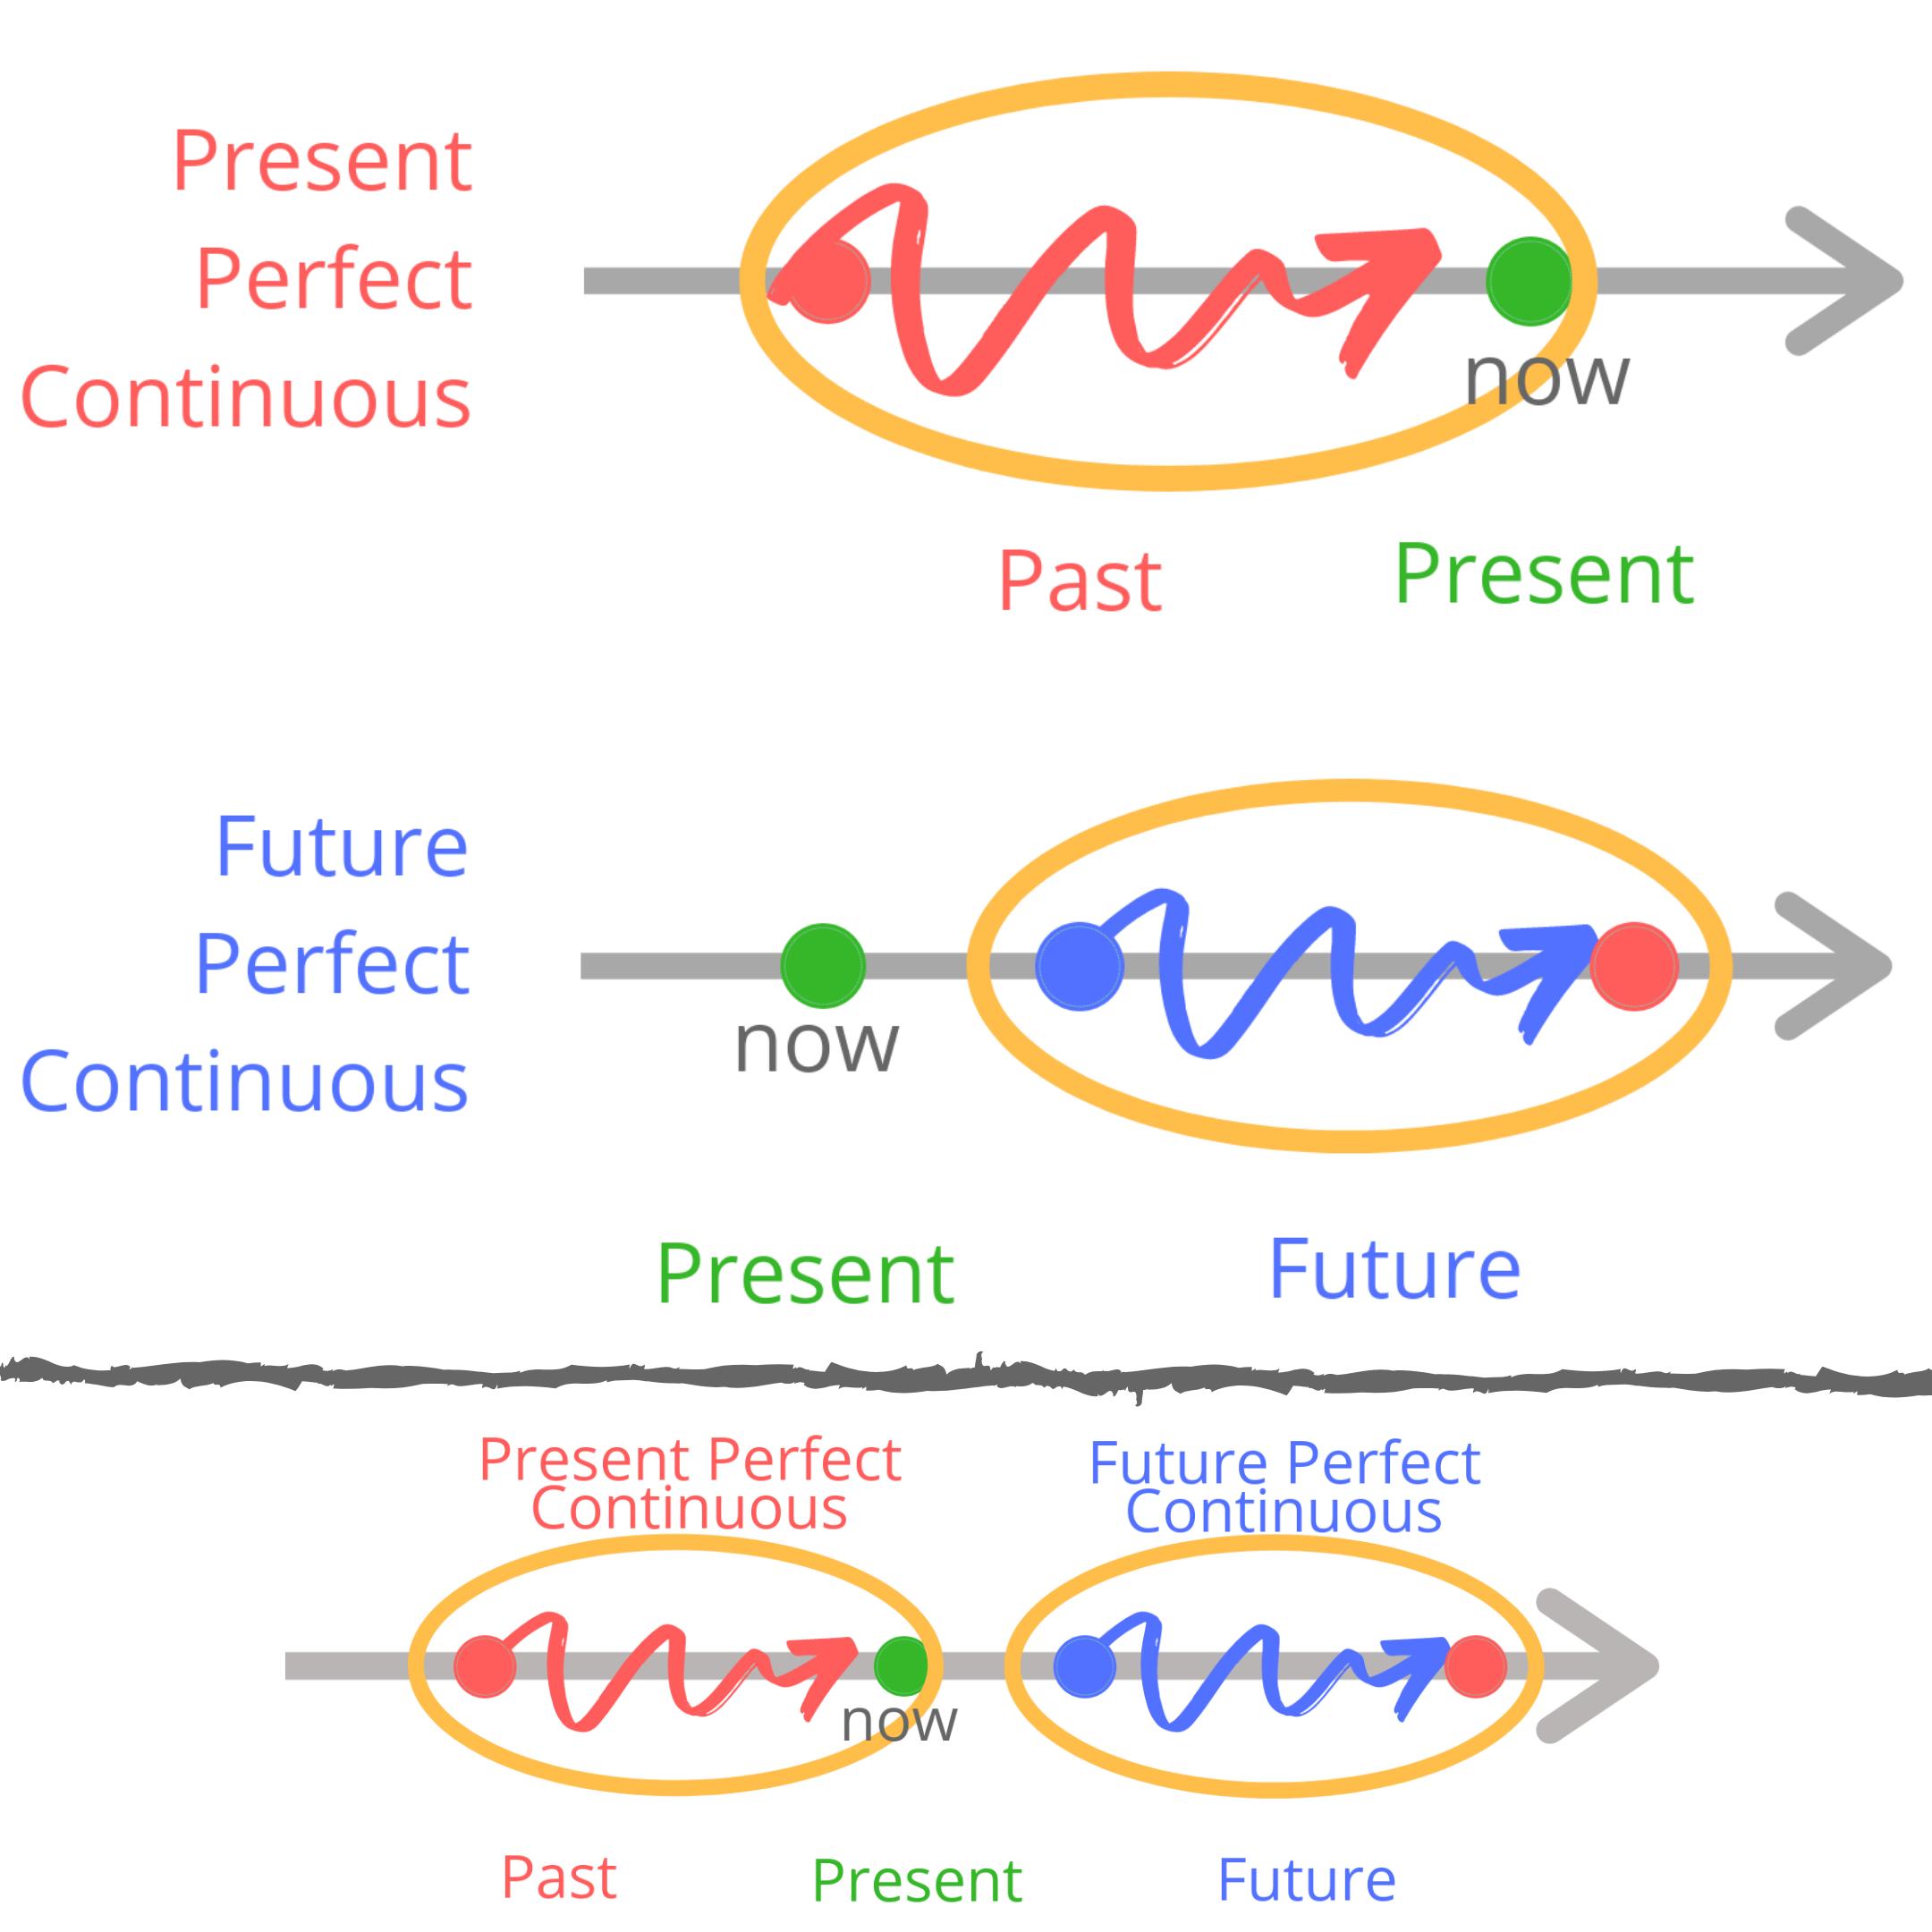 Порівняння Present і Future Perfect Continuous